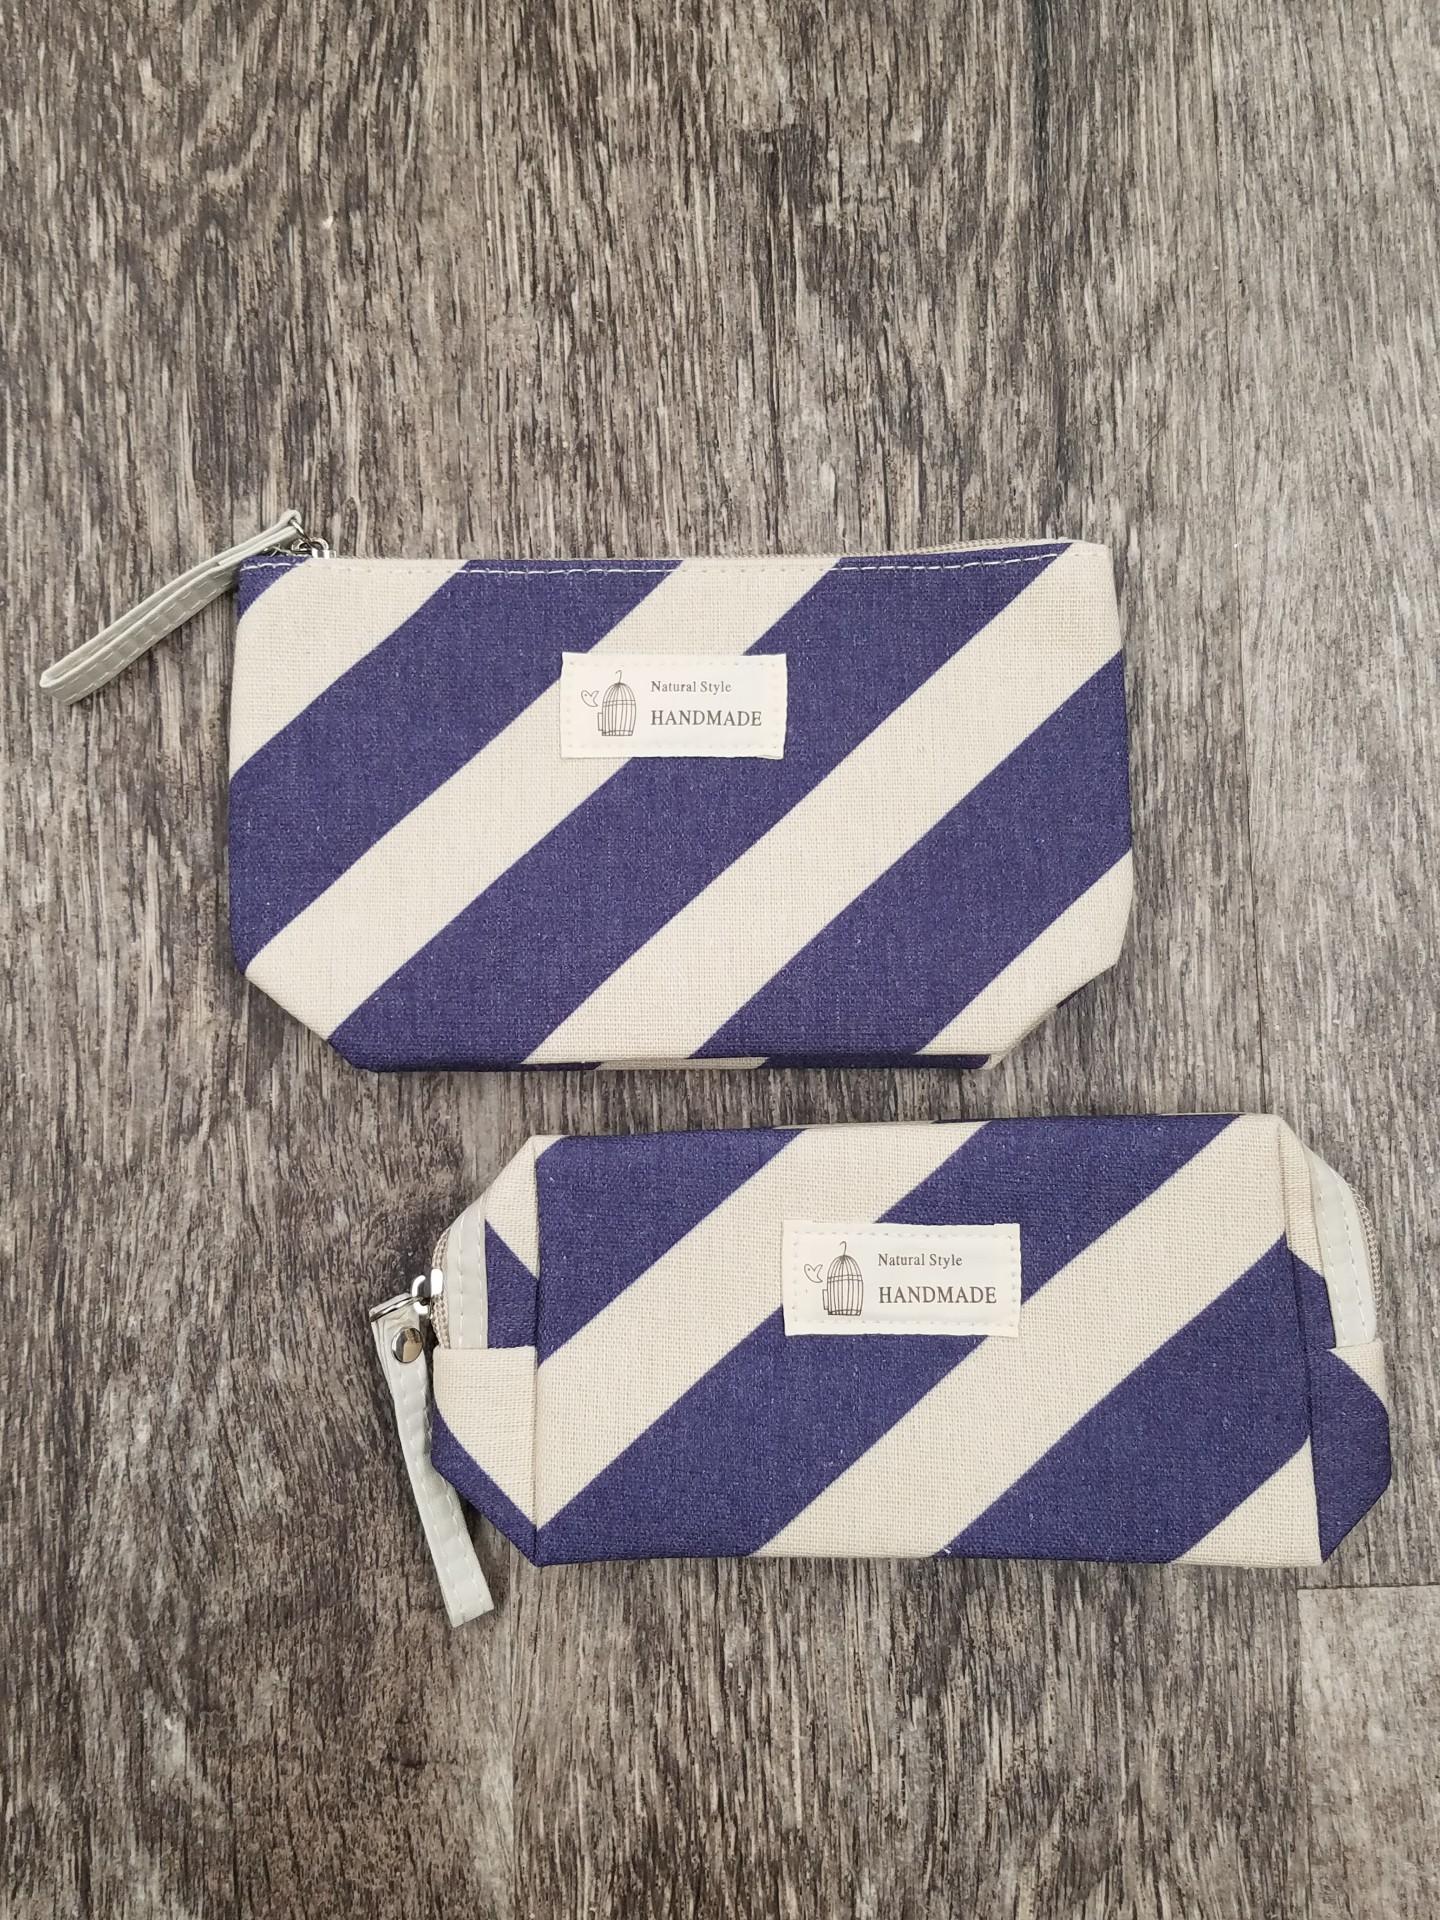 Blue Striped Makeup Case